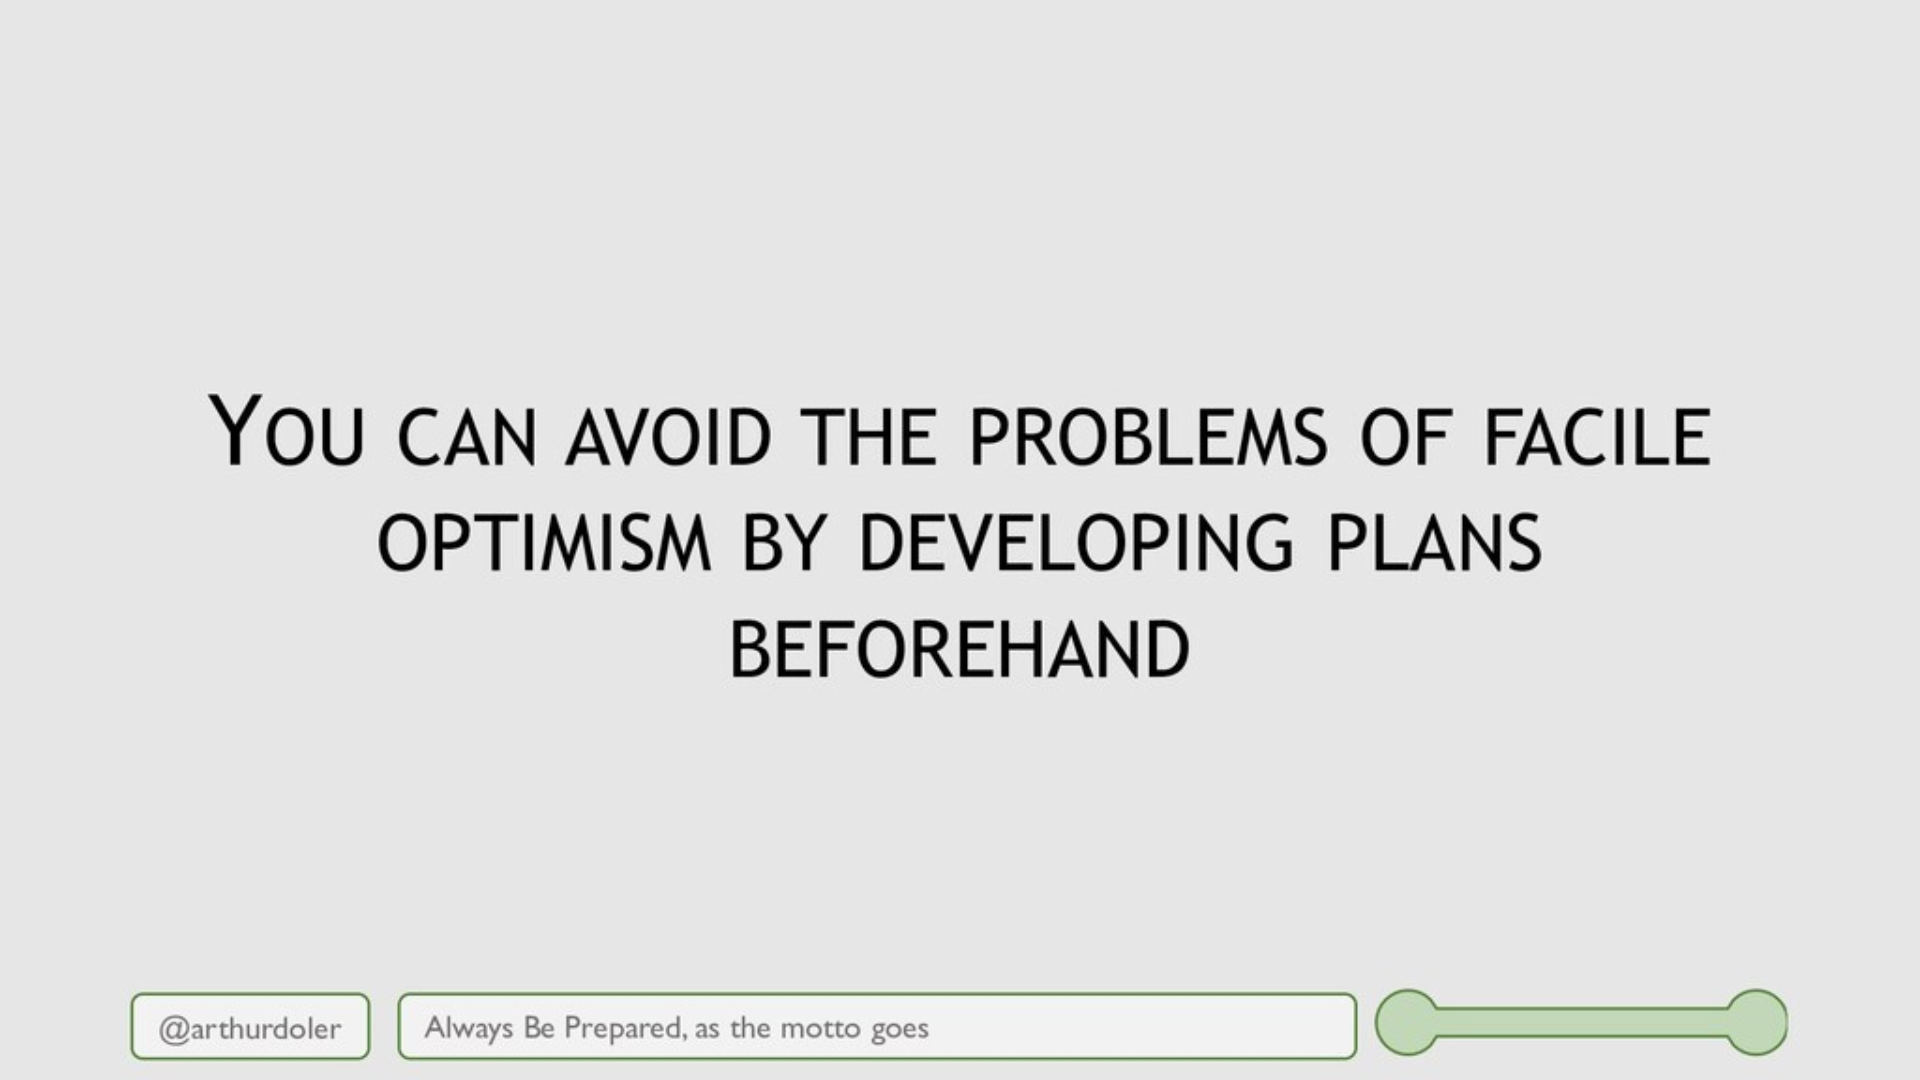 @arthurdoler YOU CAN AVOID THE PROBLEMS OF FACI...